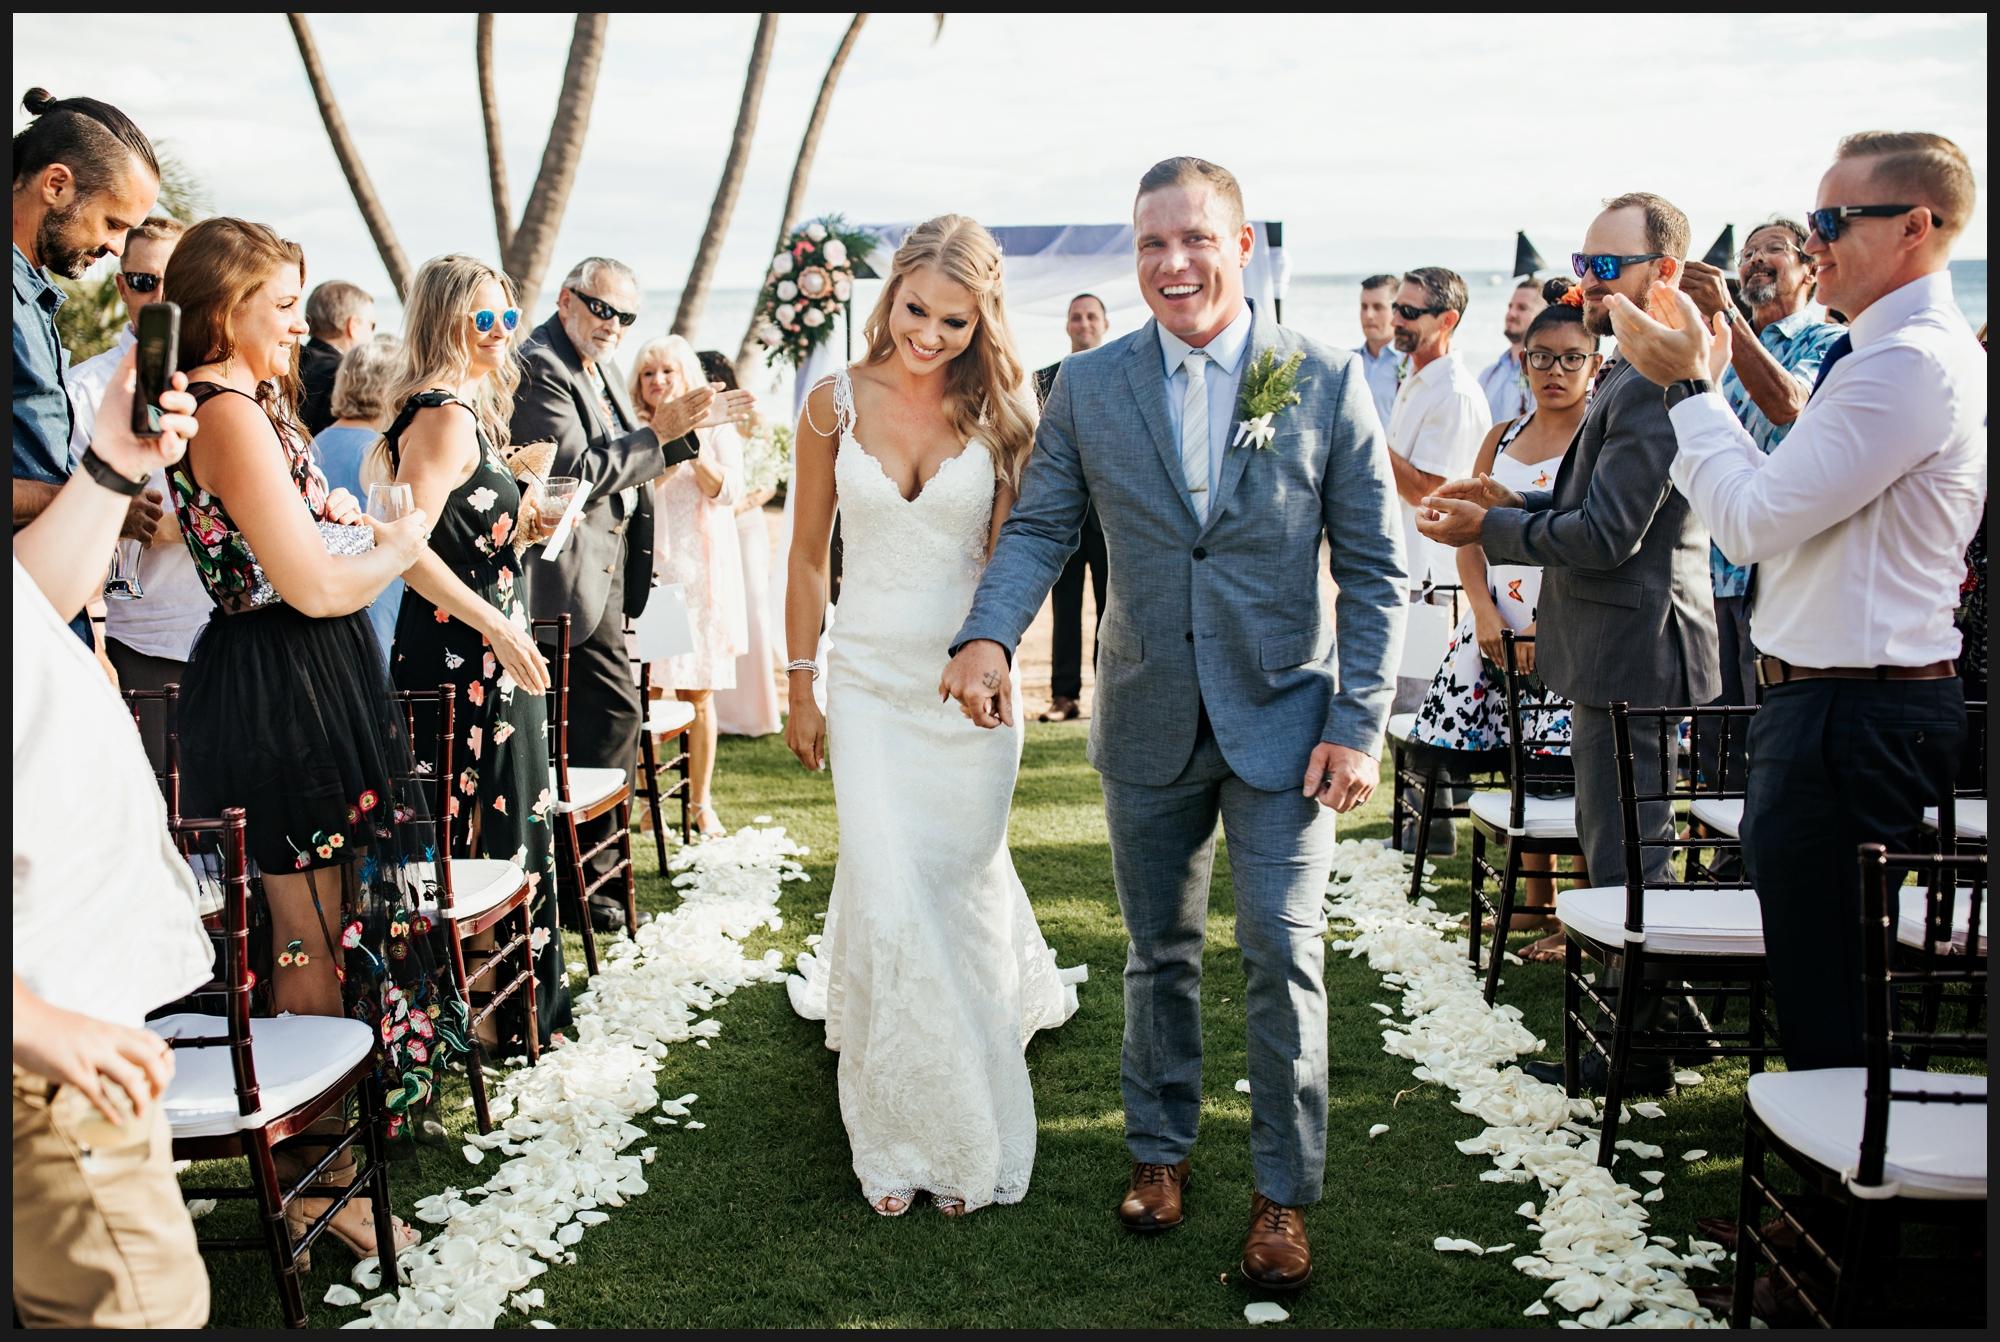 Orlando-Wedding-Photographer-destination-wedding-photographer-florida-wedding-photographer-hawaii-wedding-photographer_0065.jpg